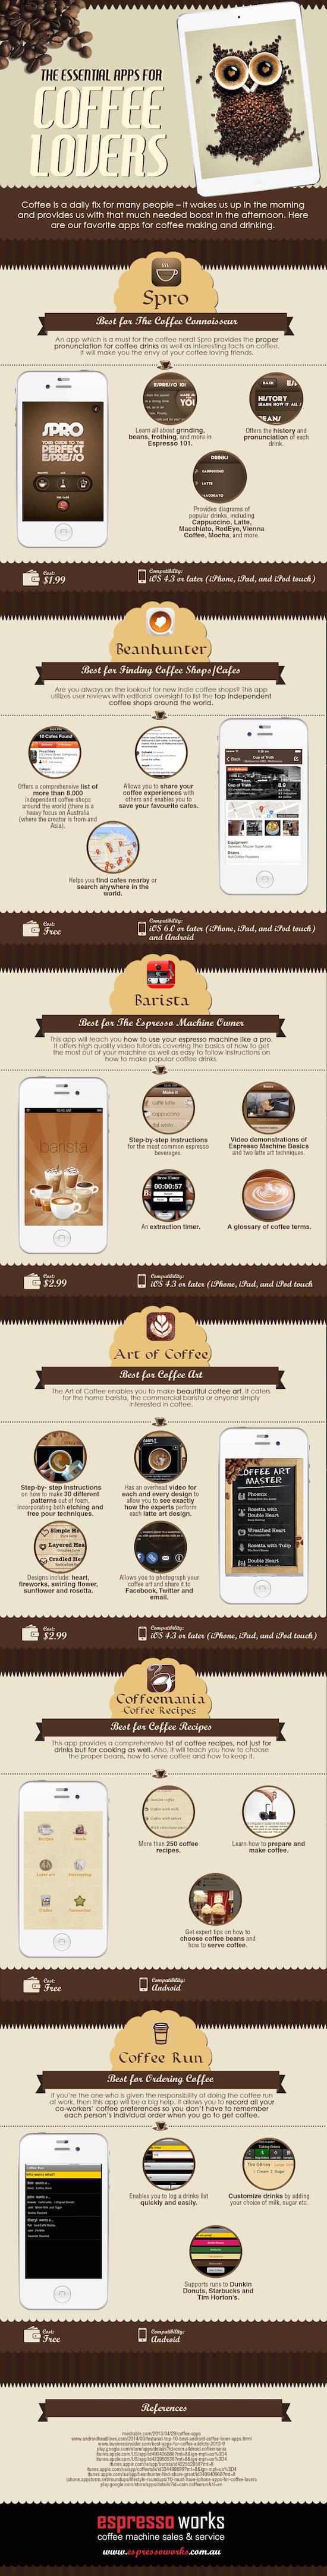 infografia-cafe-apps